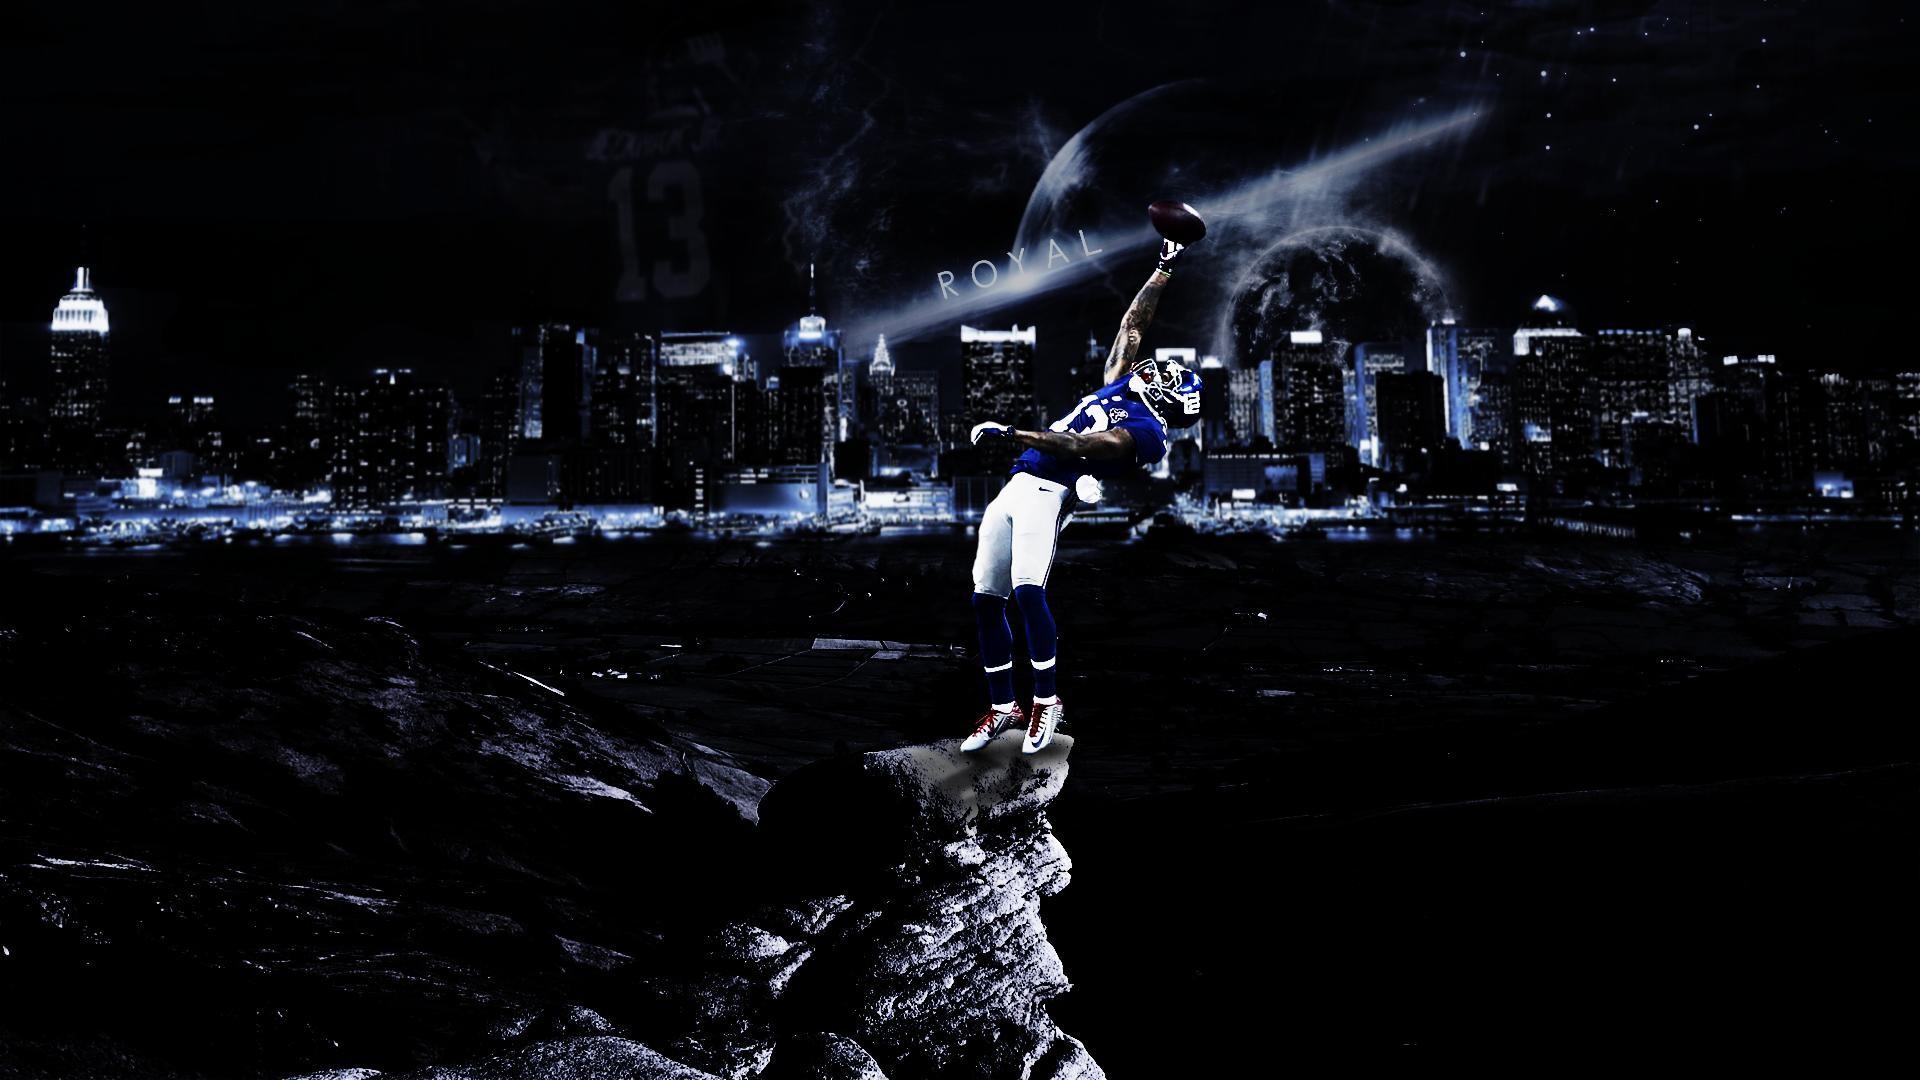 Odell-Beckham-JR-Full-HD-Background-http-and-